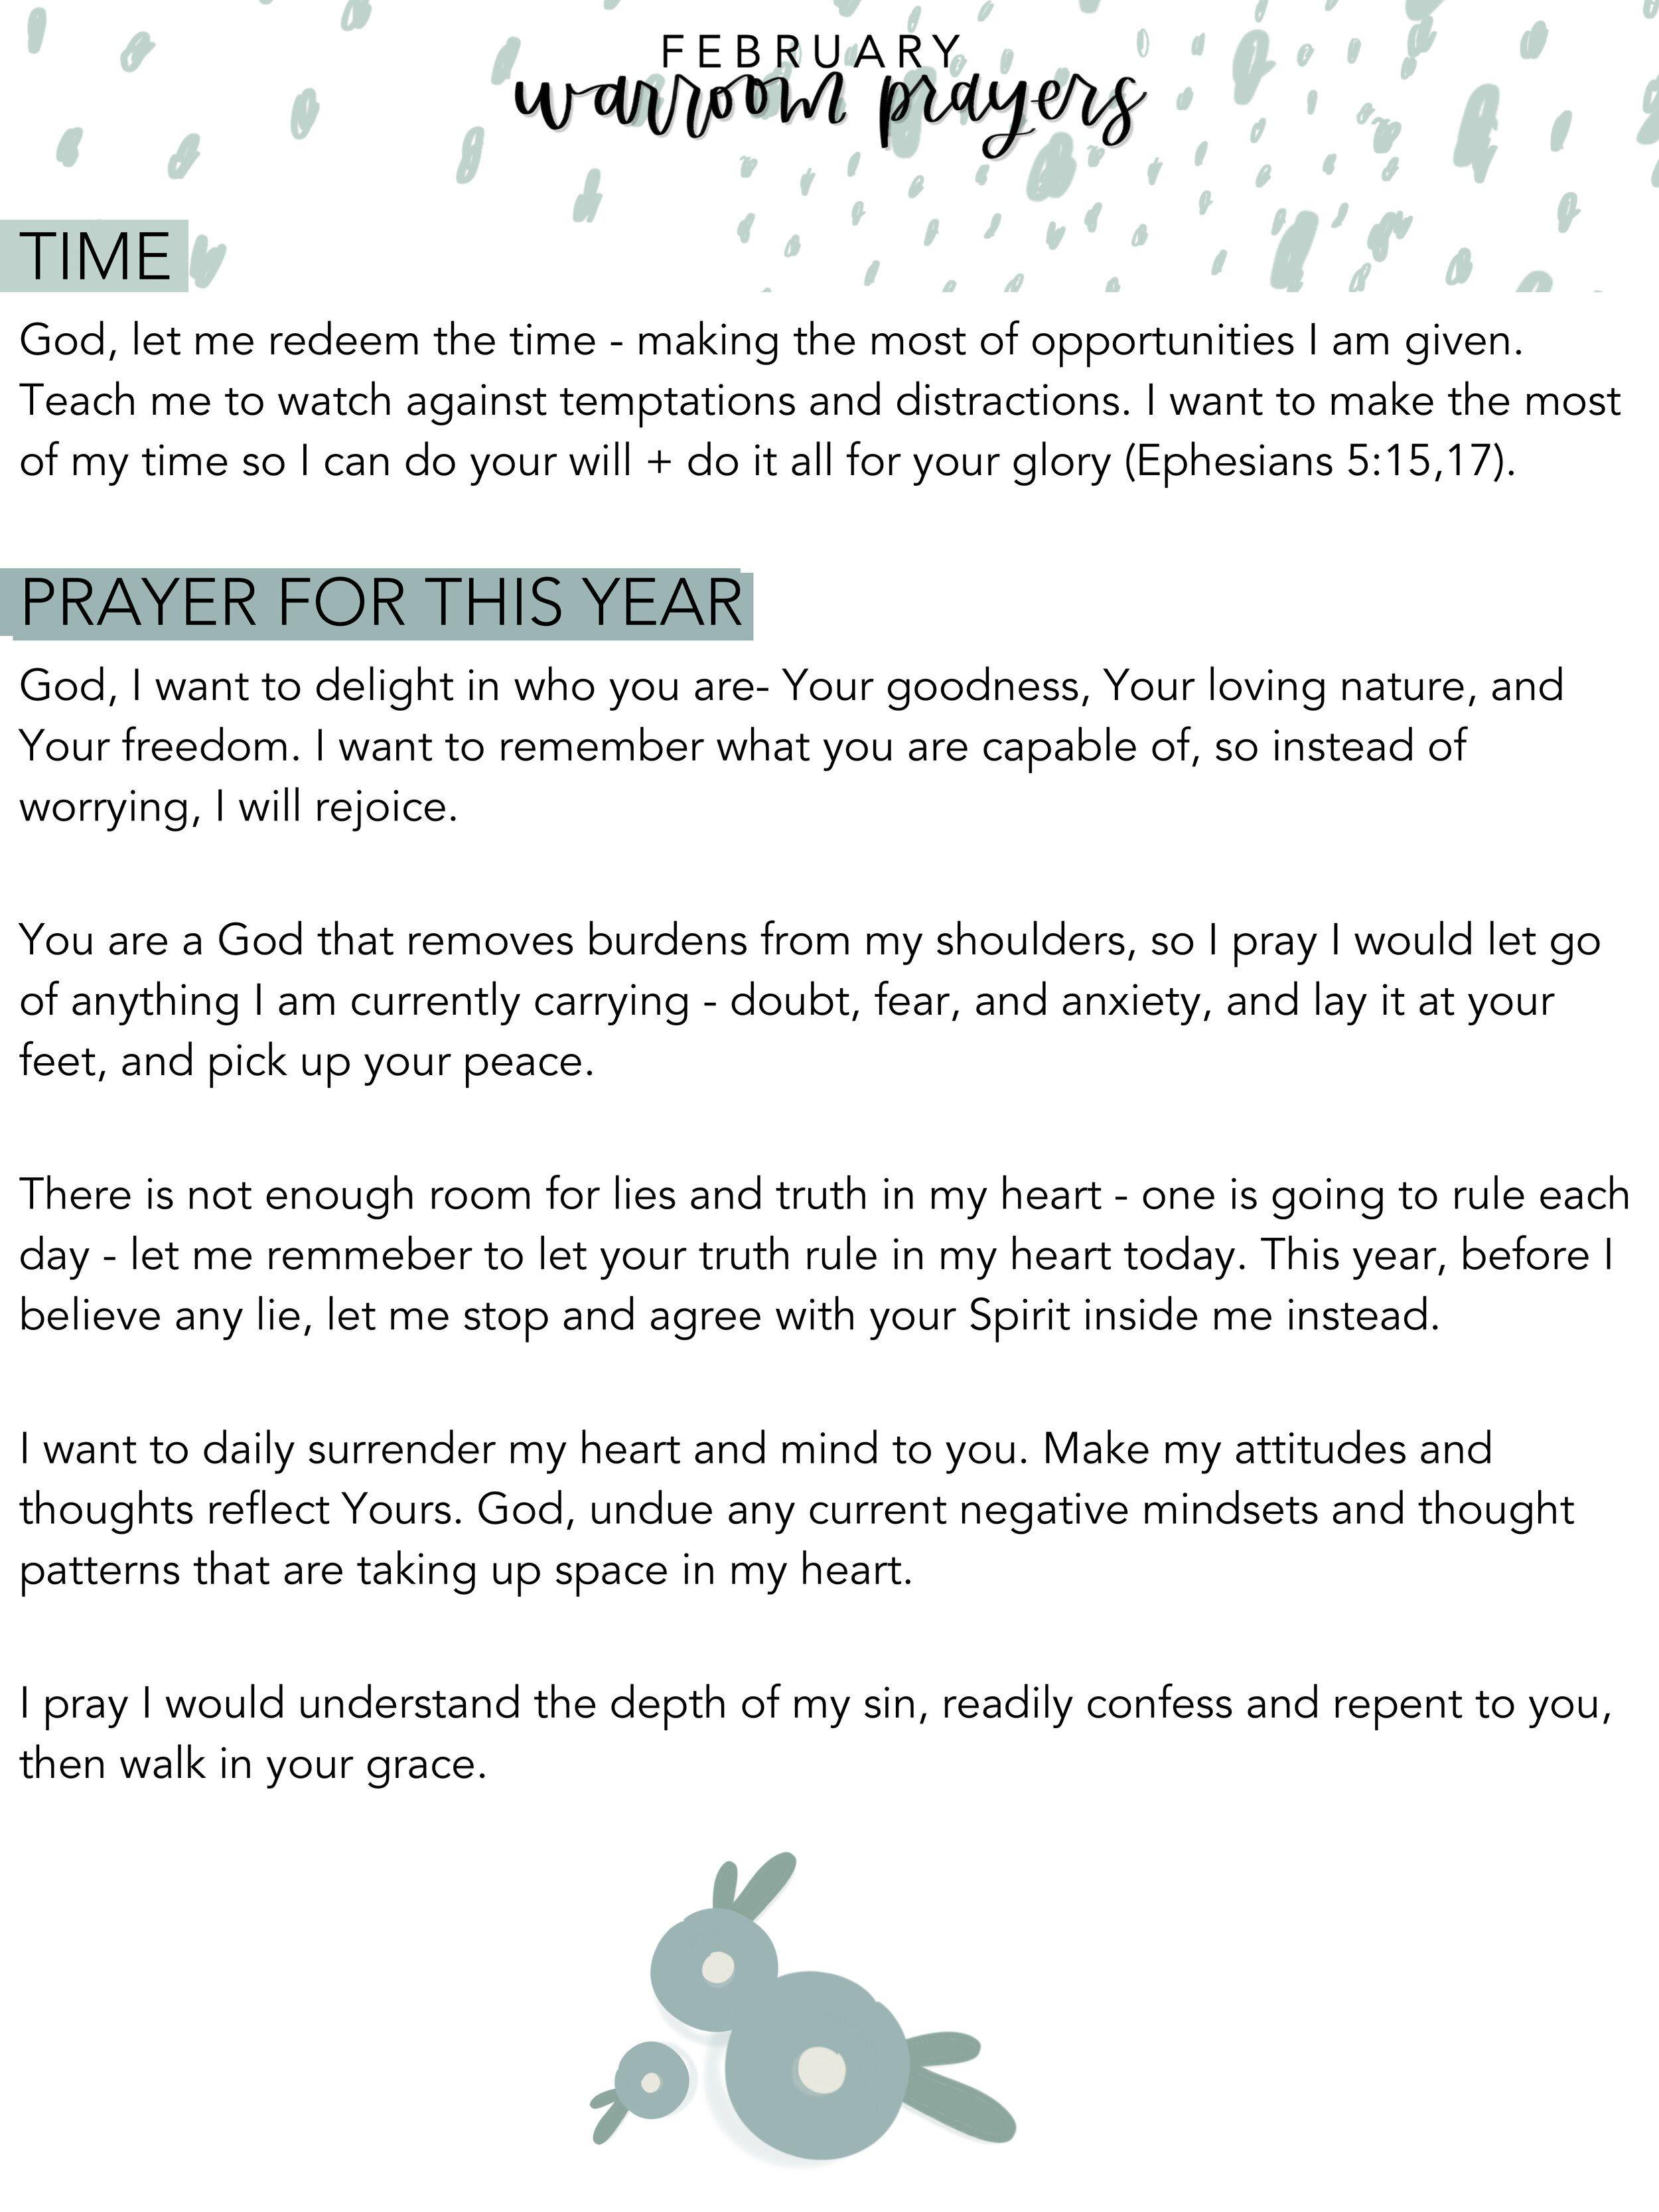 February Warroom Prayers Find Wondrous Things Prayers Prayer Times Redeeming The Time